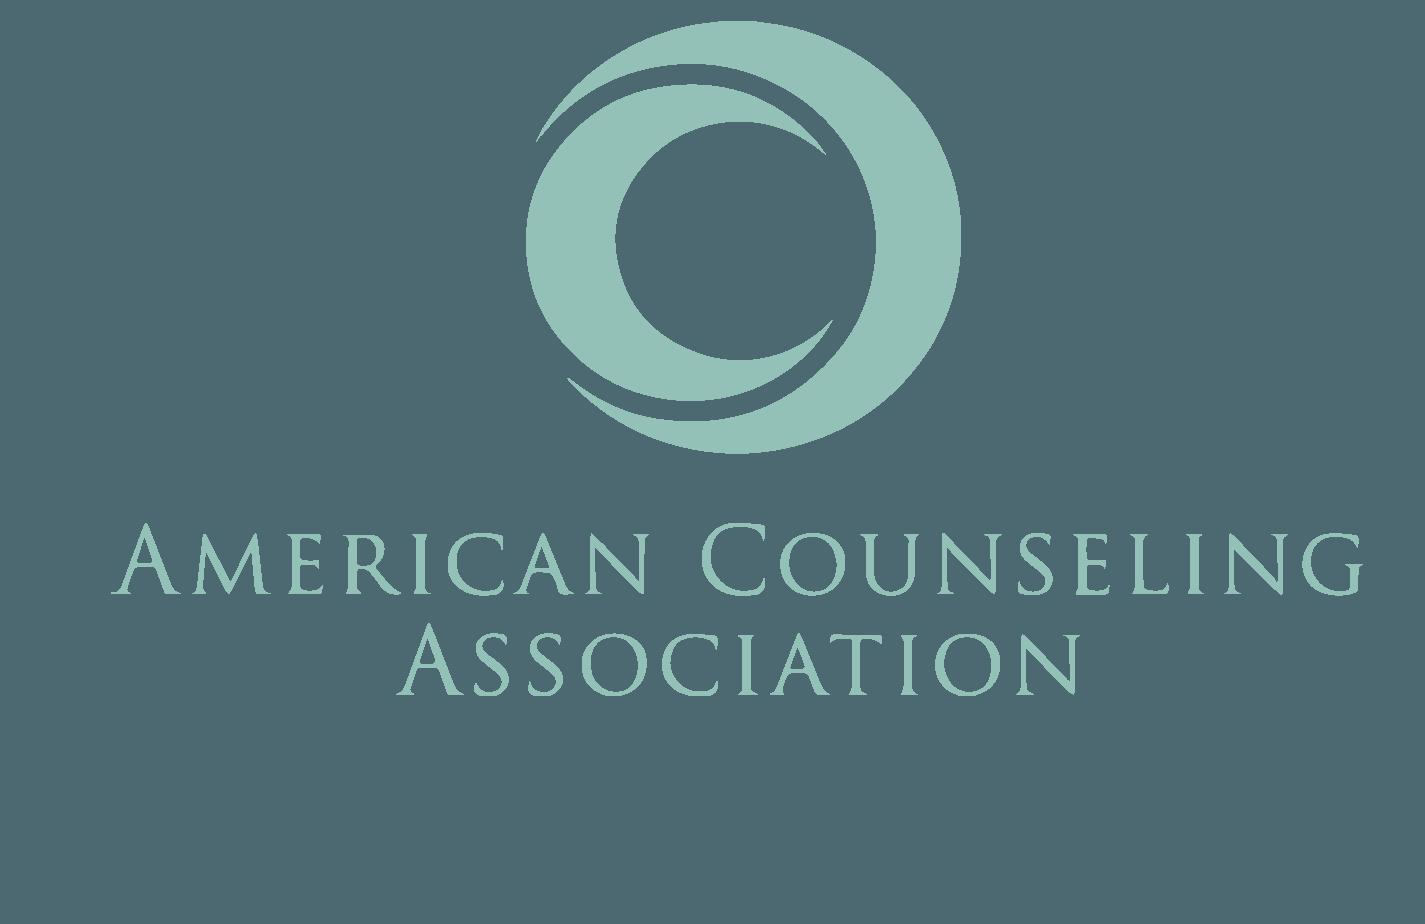 https://www.counseling.org/docs/default-source/vistas/article_75.pdf?sfvrsn=7